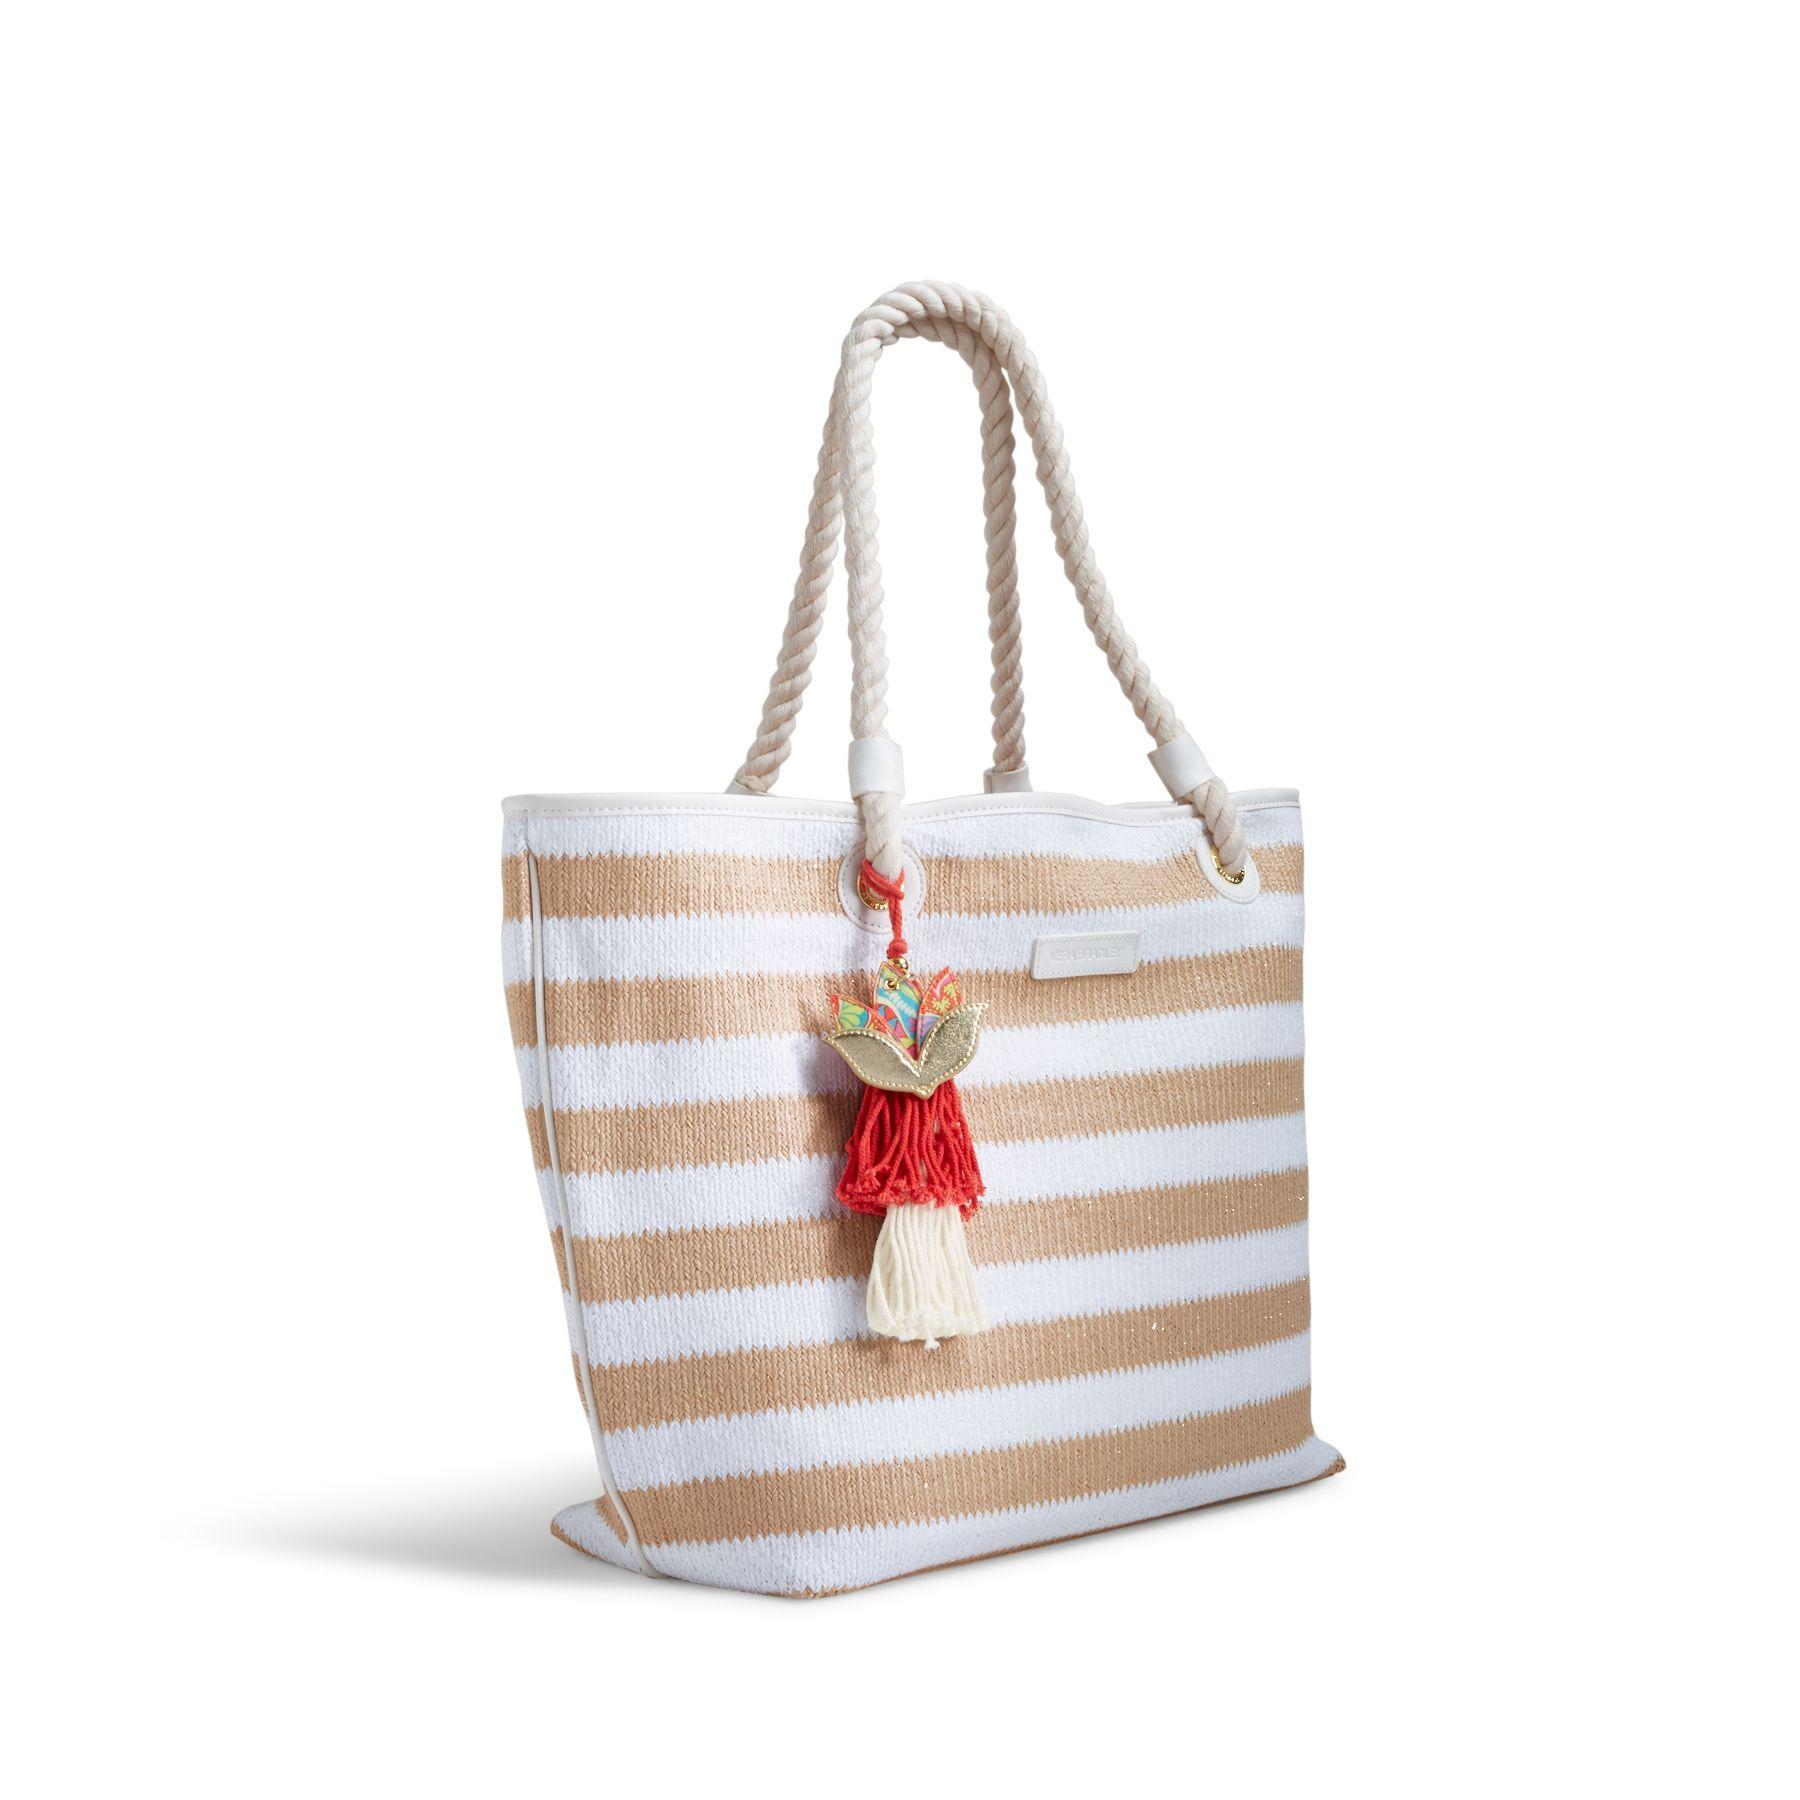 Ebay Vera Bradley Beach Towel: Vera Bradley Striped Beach Tote Bag In Natural Stripe